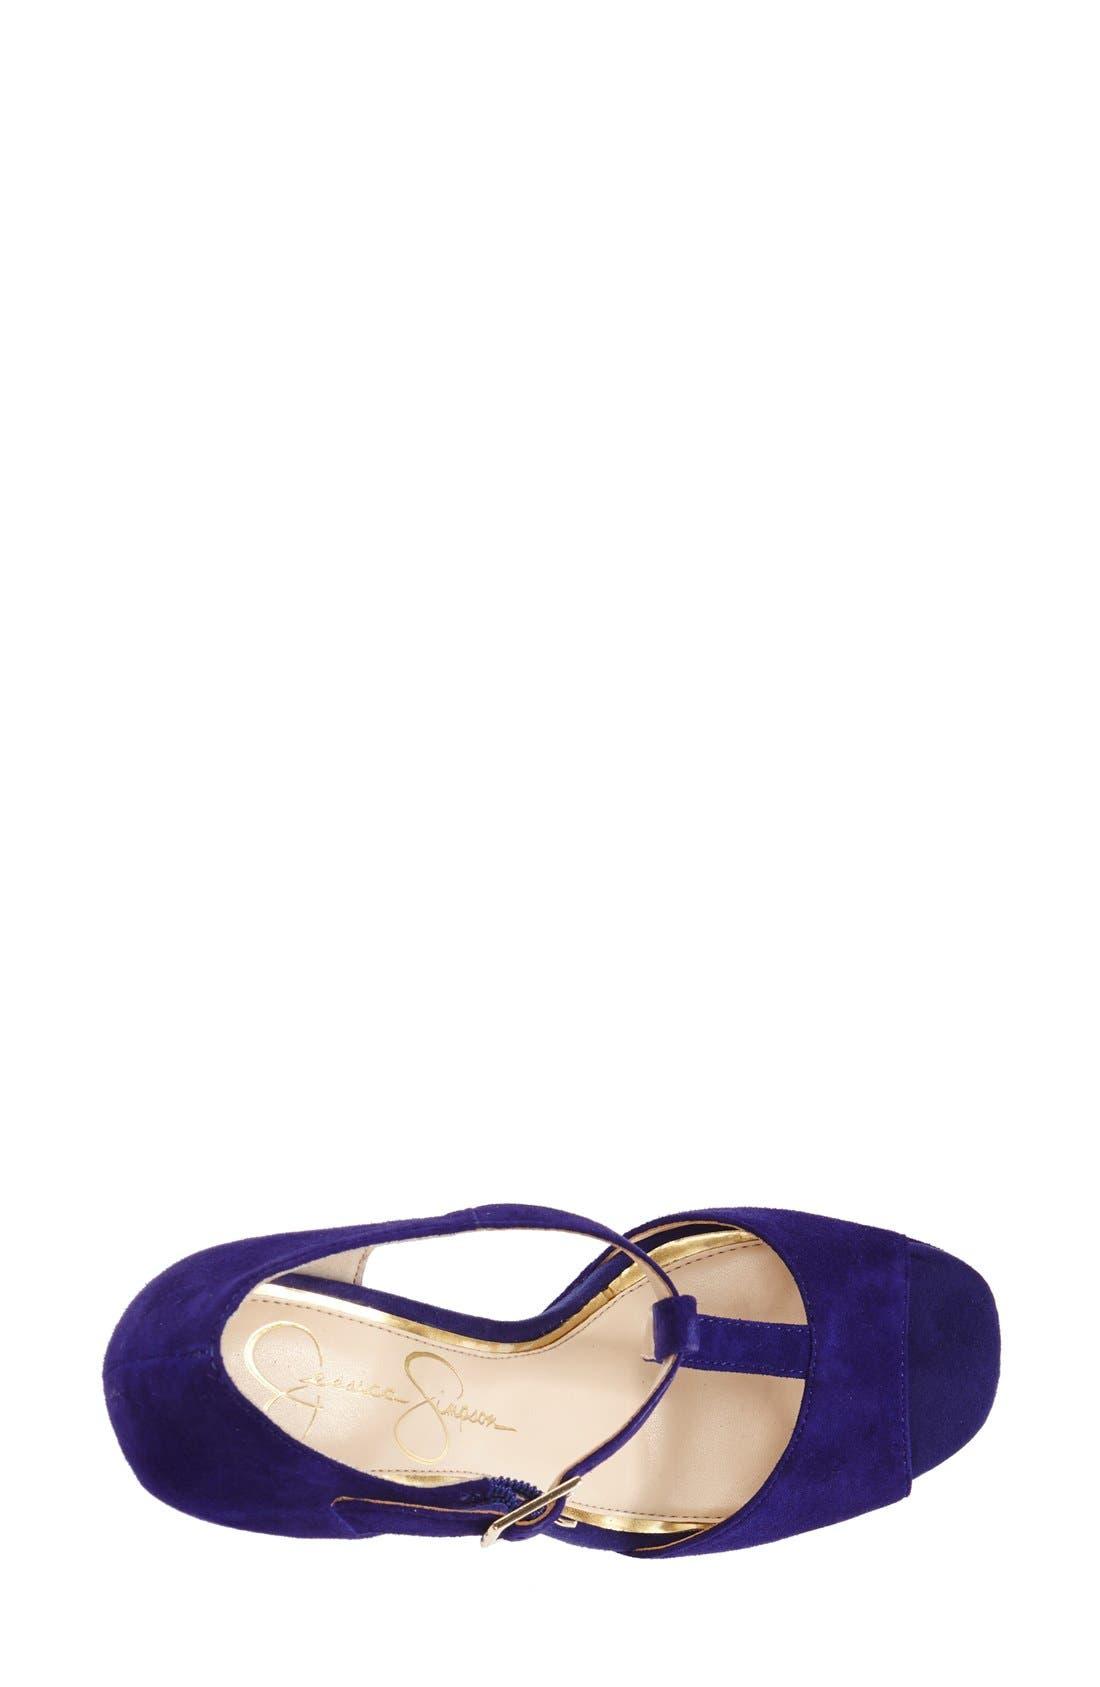 Alternate Image 3  - Jessica Simpson 'Adelinah' T-Strap Platform Sandal (Women)